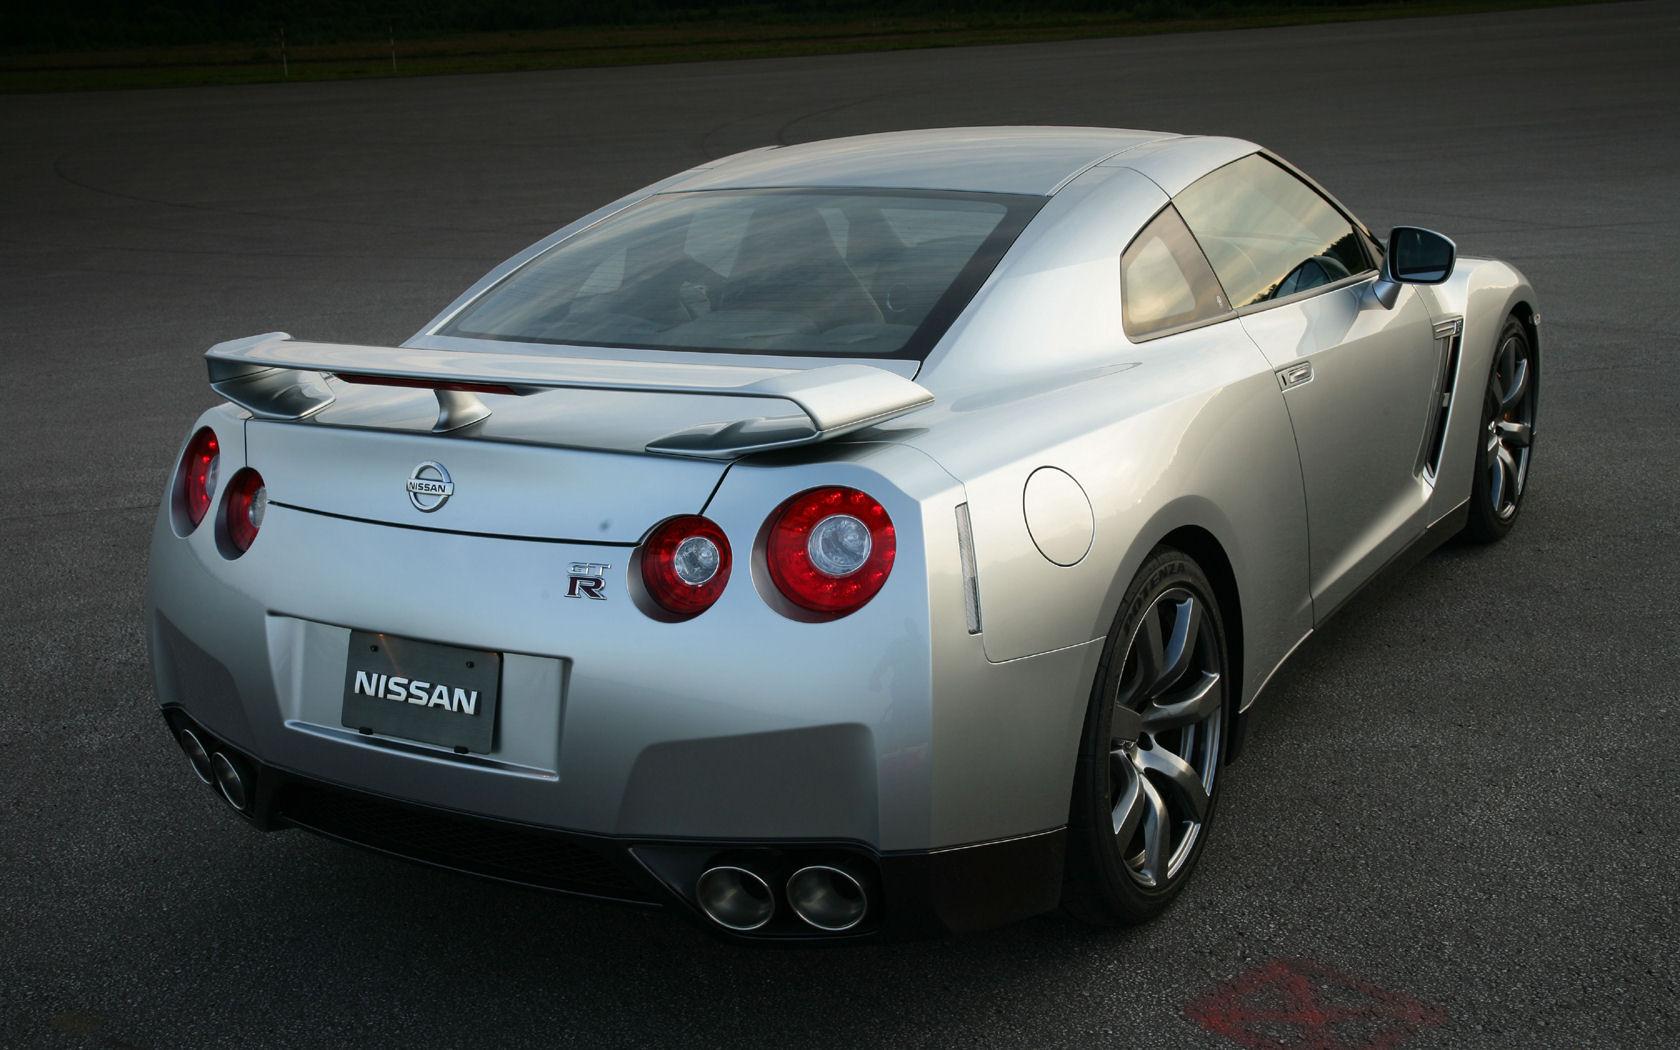 Nissan GT R V6 Turbo AWD ATTESA GTR   Widescreen Wallpaper 1680x1050